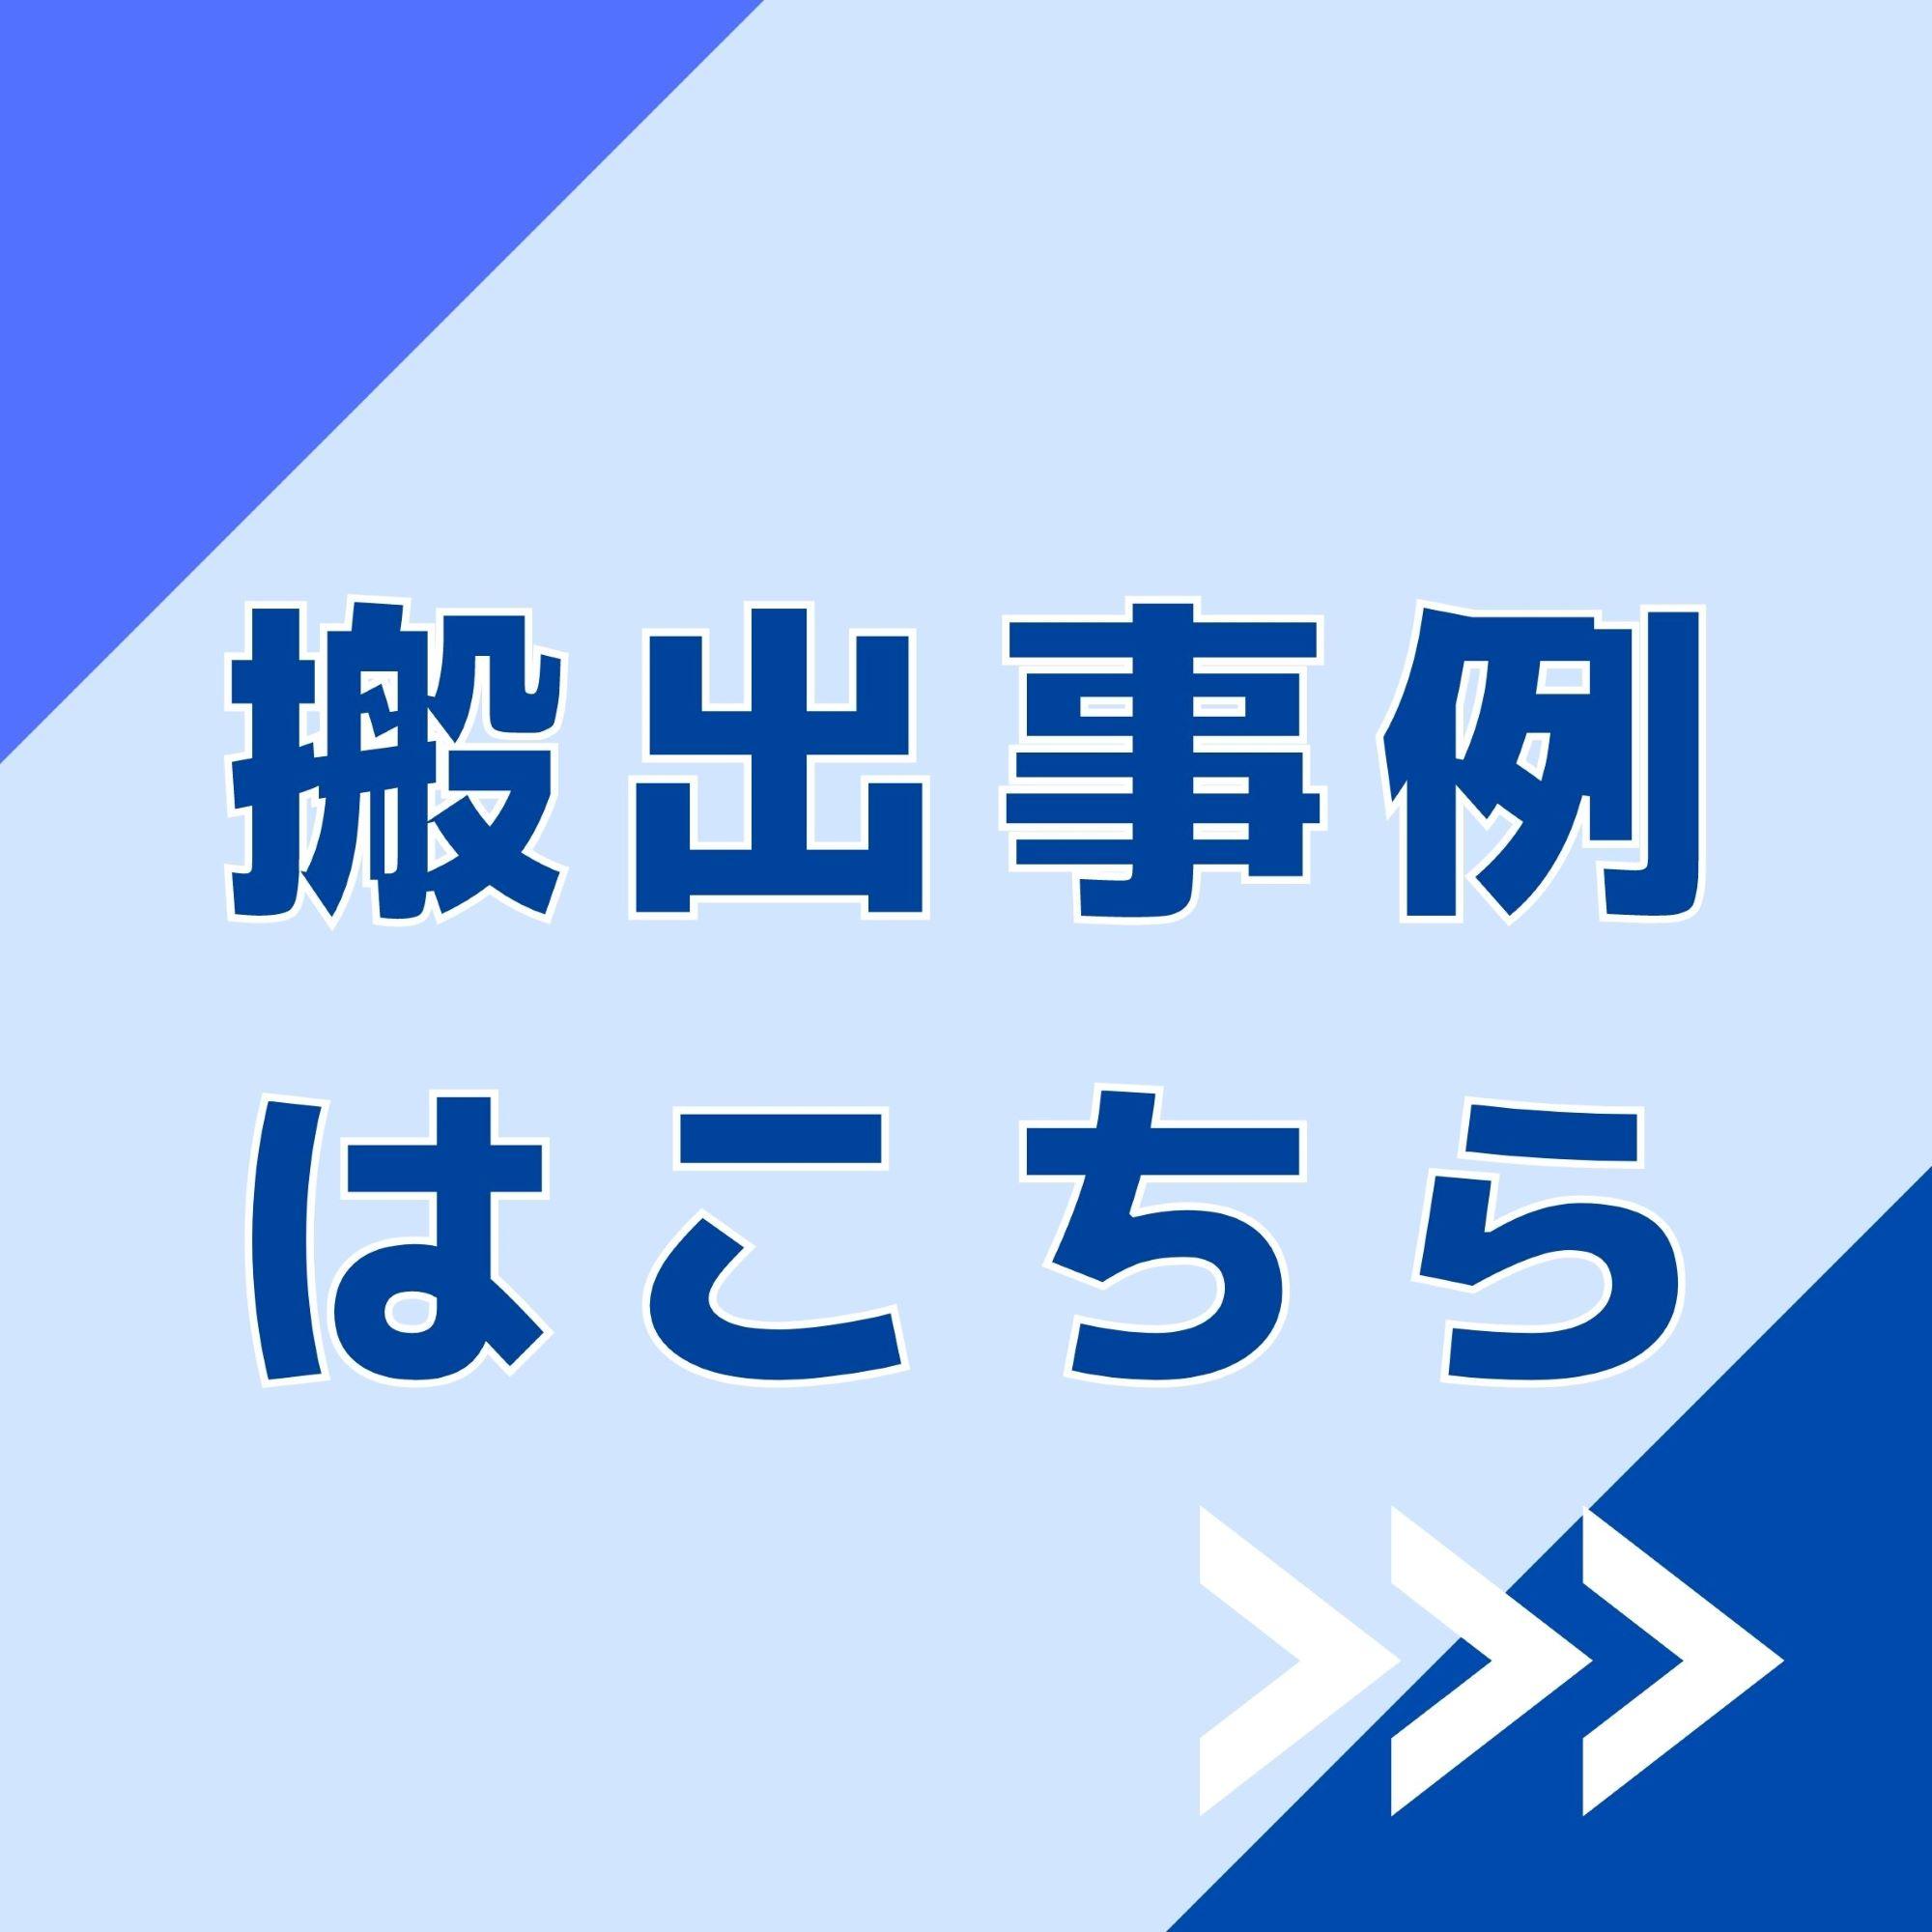 hansyutsu-01.jpg